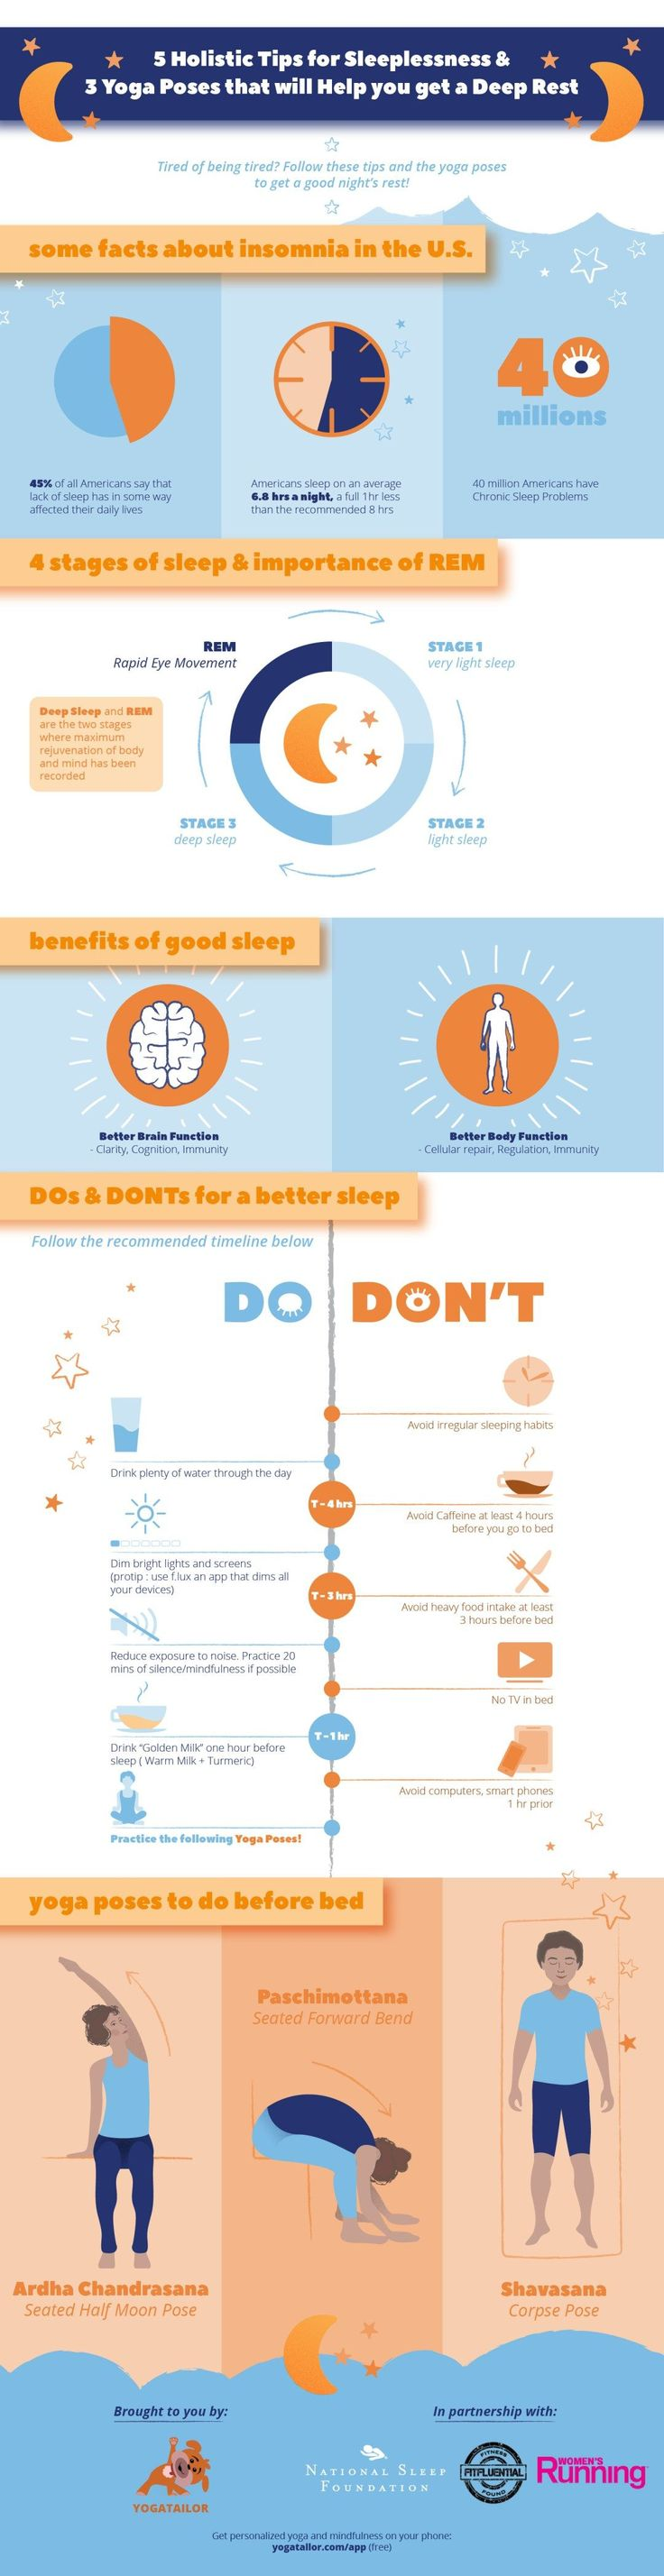 Holistic Guide to Better Sleep #infographic #insomnia #yoga #meditation #mindfulness